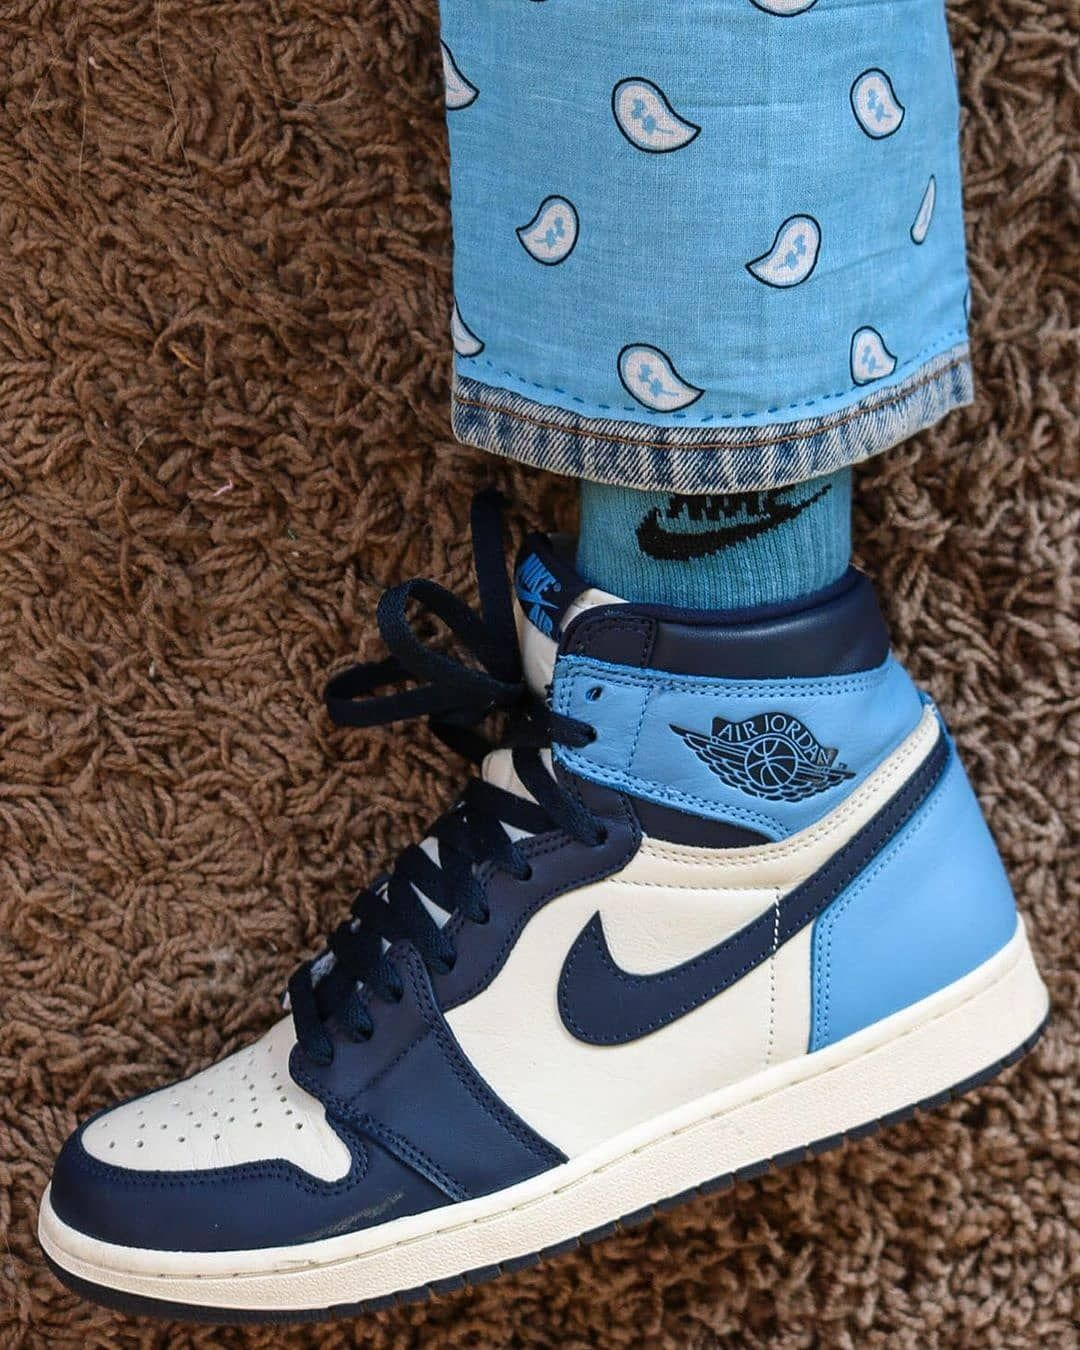 Air Jordan 1 Retro High Og Obsidian University Blue Nike Jordans Pin On Outfits